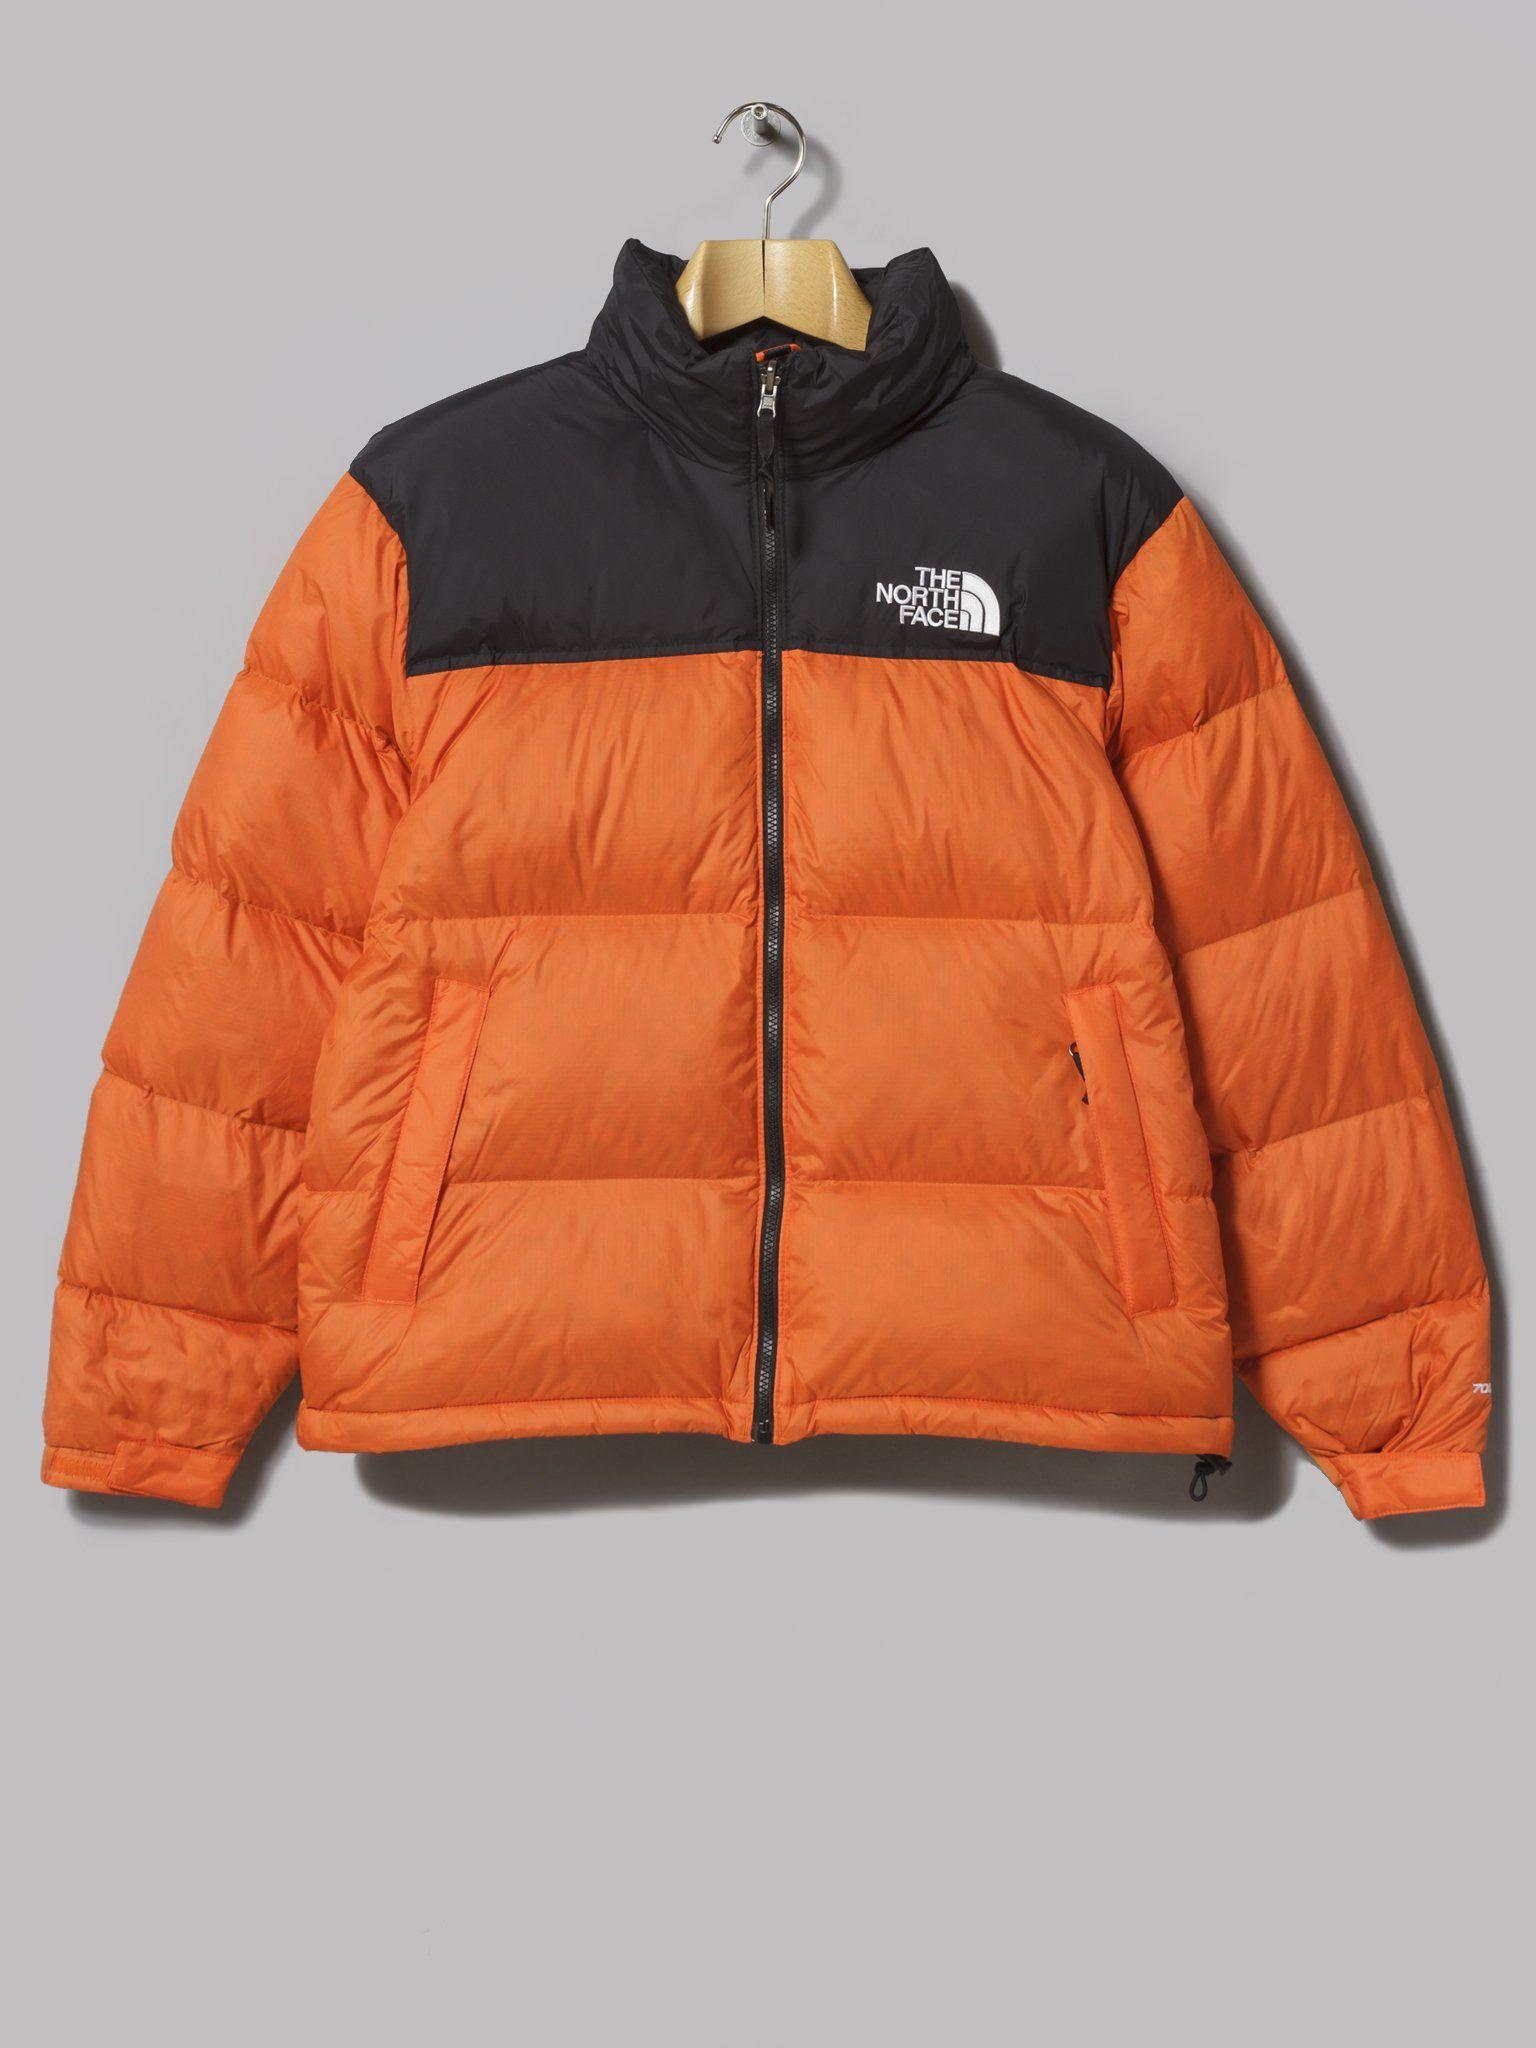 The North Face 1996 Retro Nuptse Jacket Persian Orange [ 2048 x 1536 Pixel ]